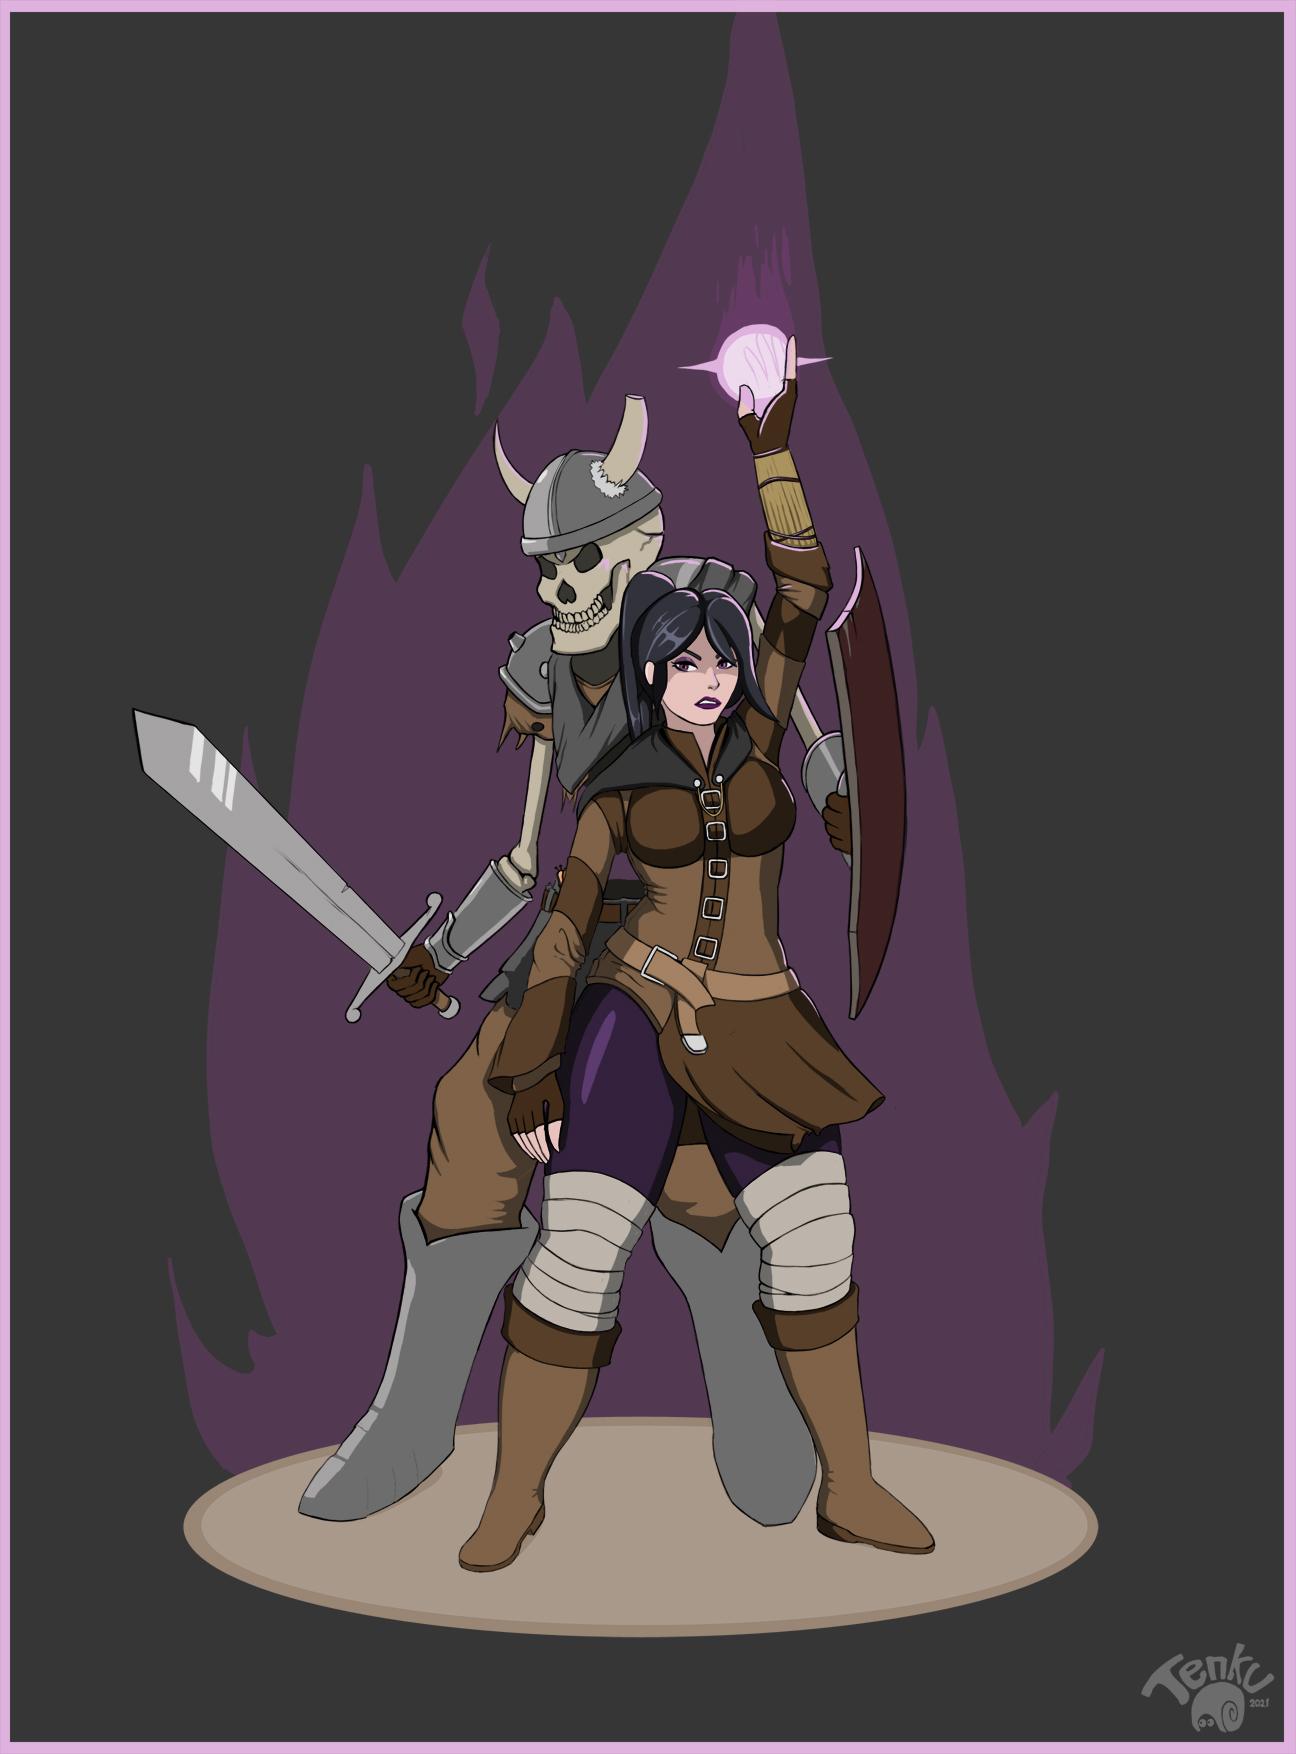 Morwen of Myrefall